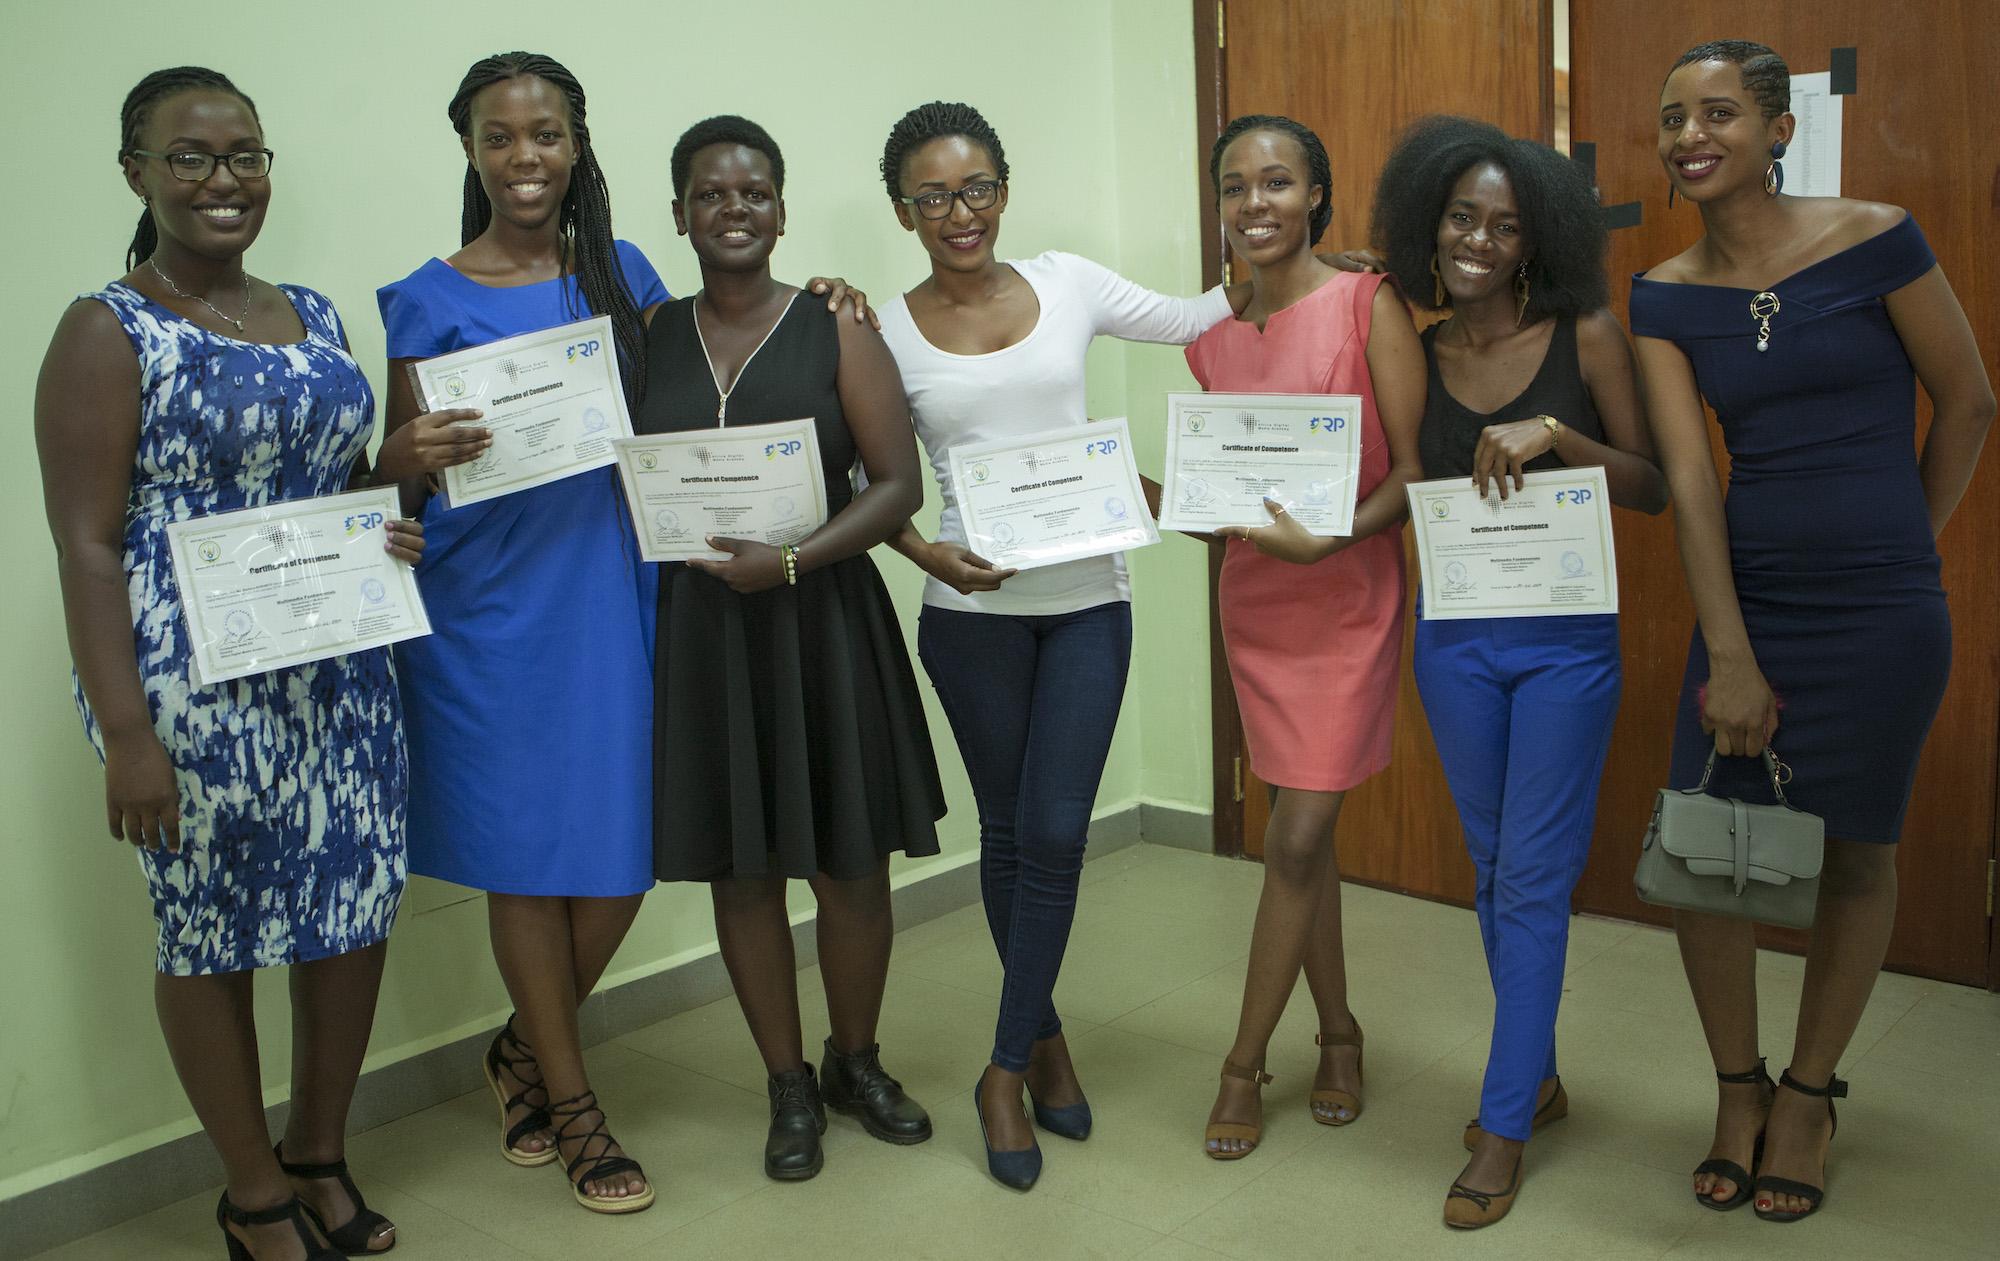 ADMA Graduates (left to right) Barbara, Sandrine, Marie Merci, Adeline, Sharon, Sandrine, and Liliane.